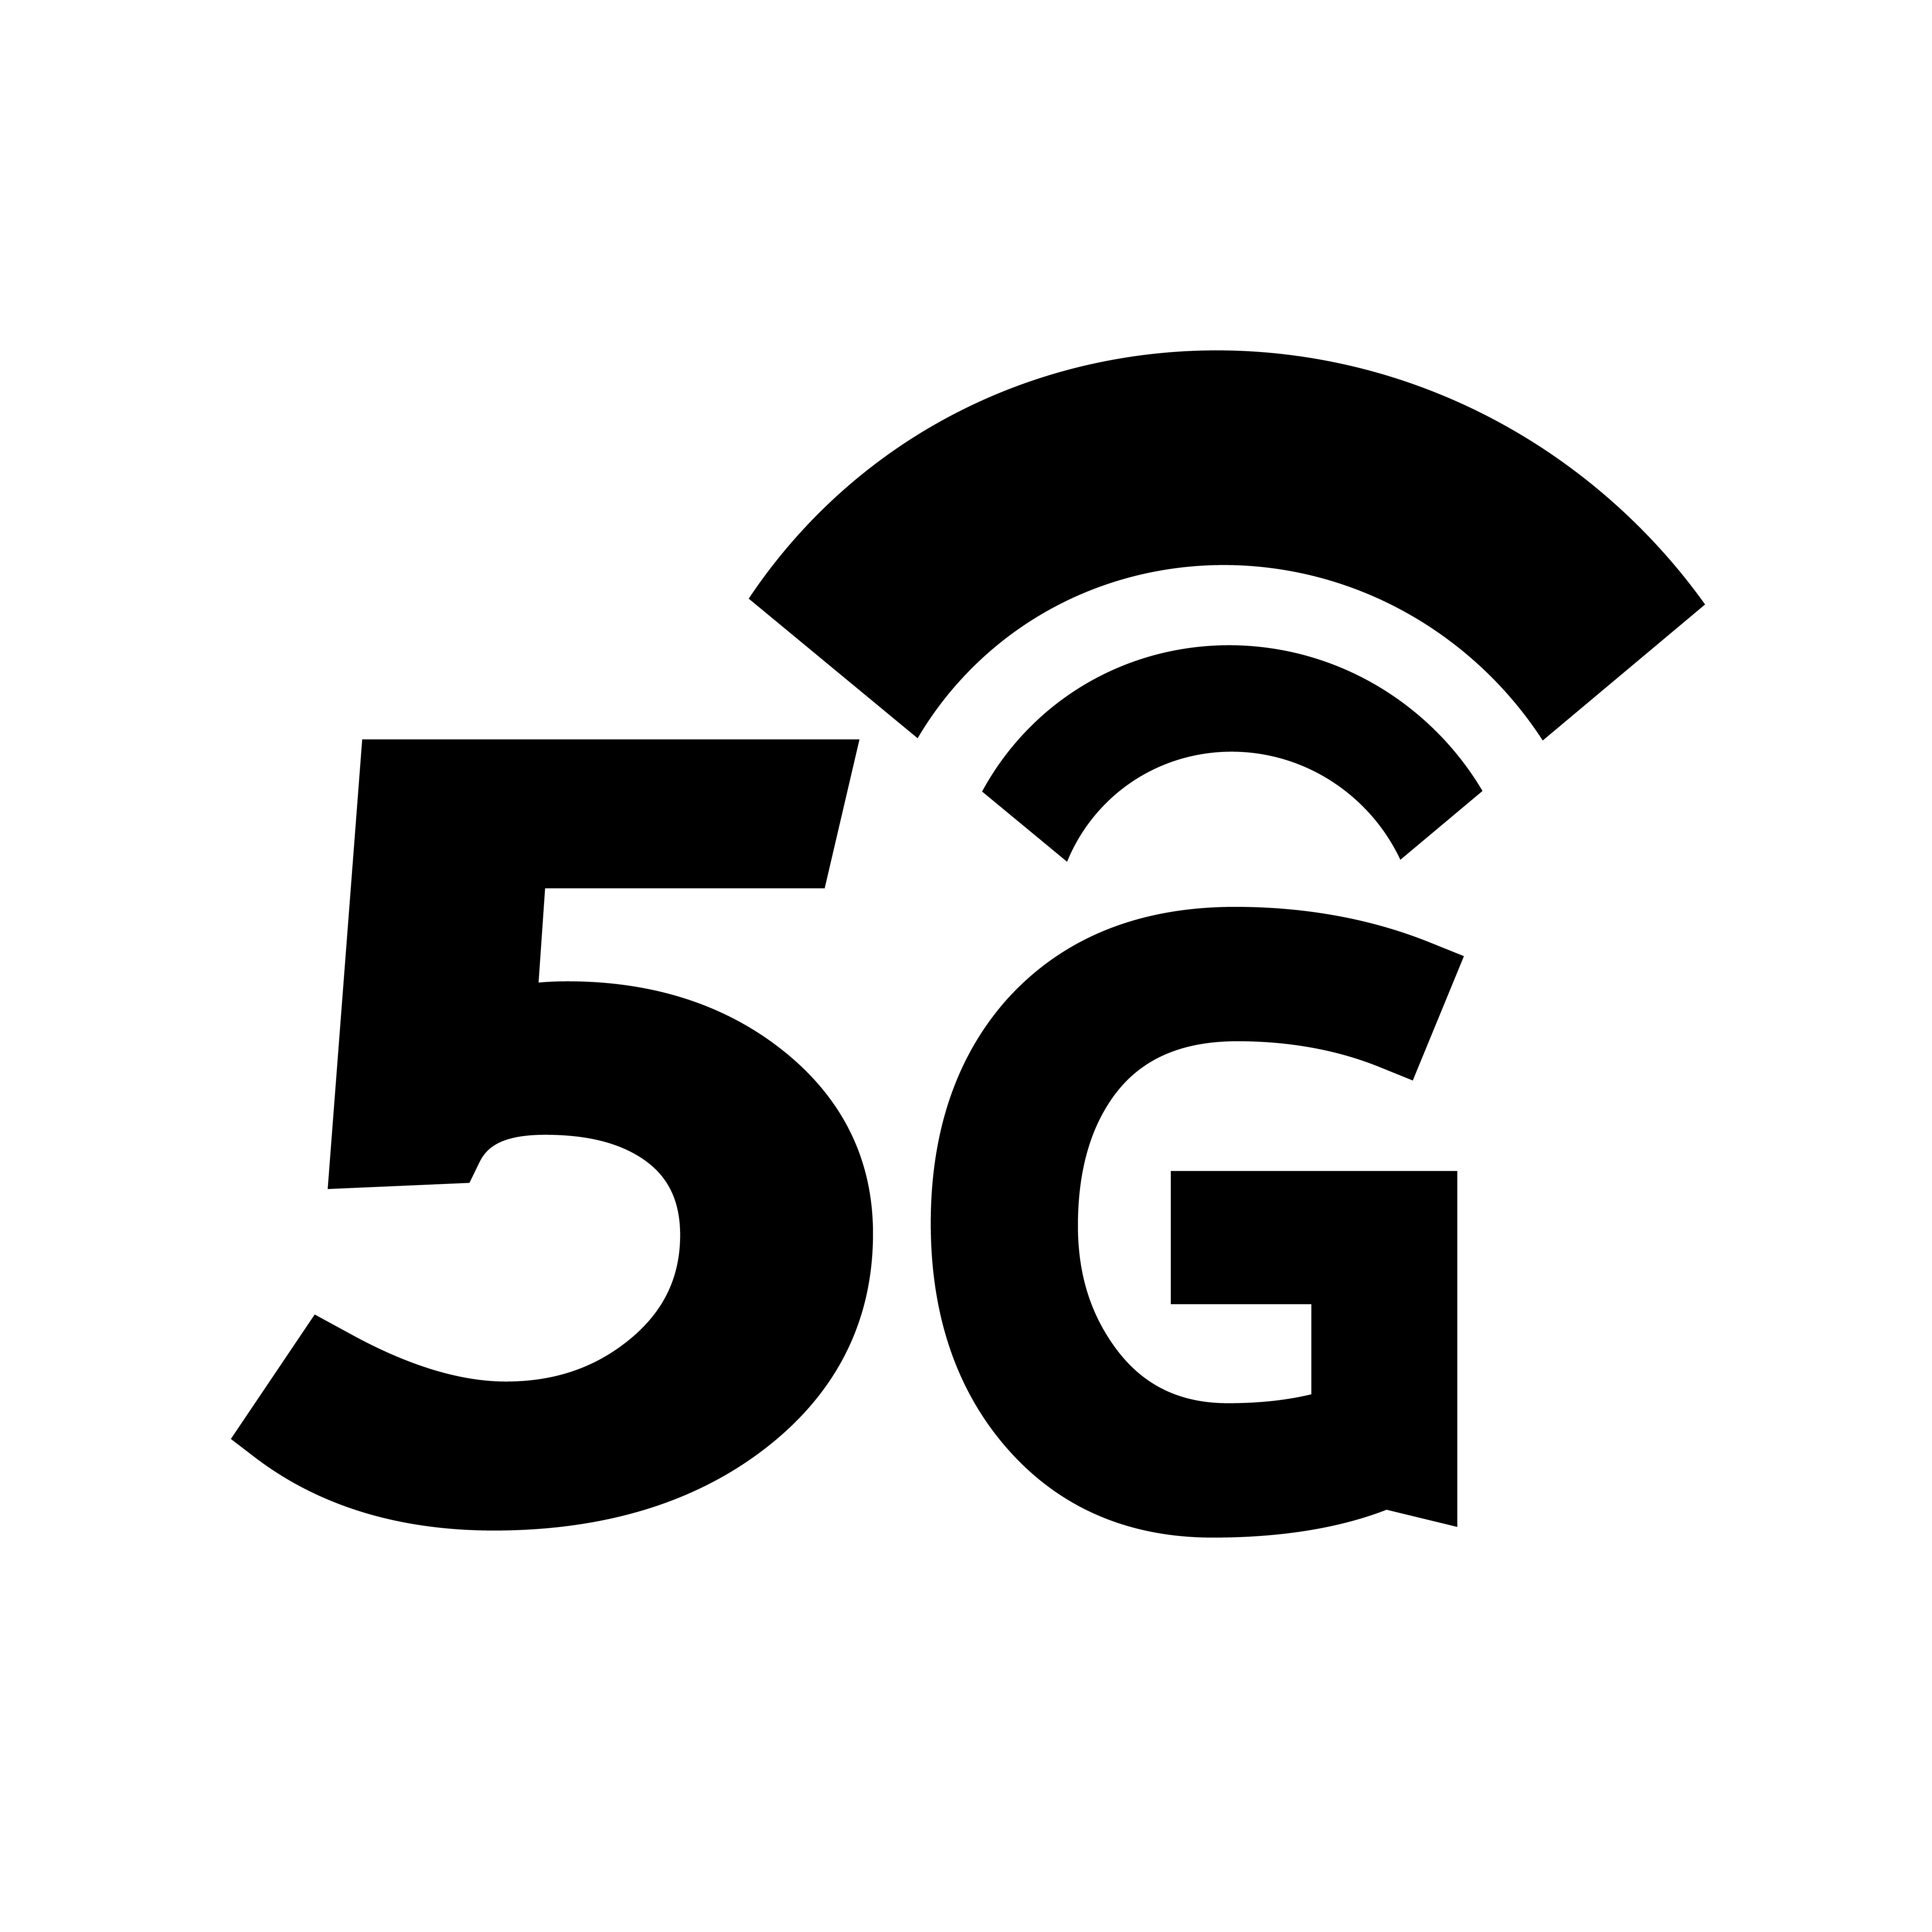 5g Network Free Vector Art.